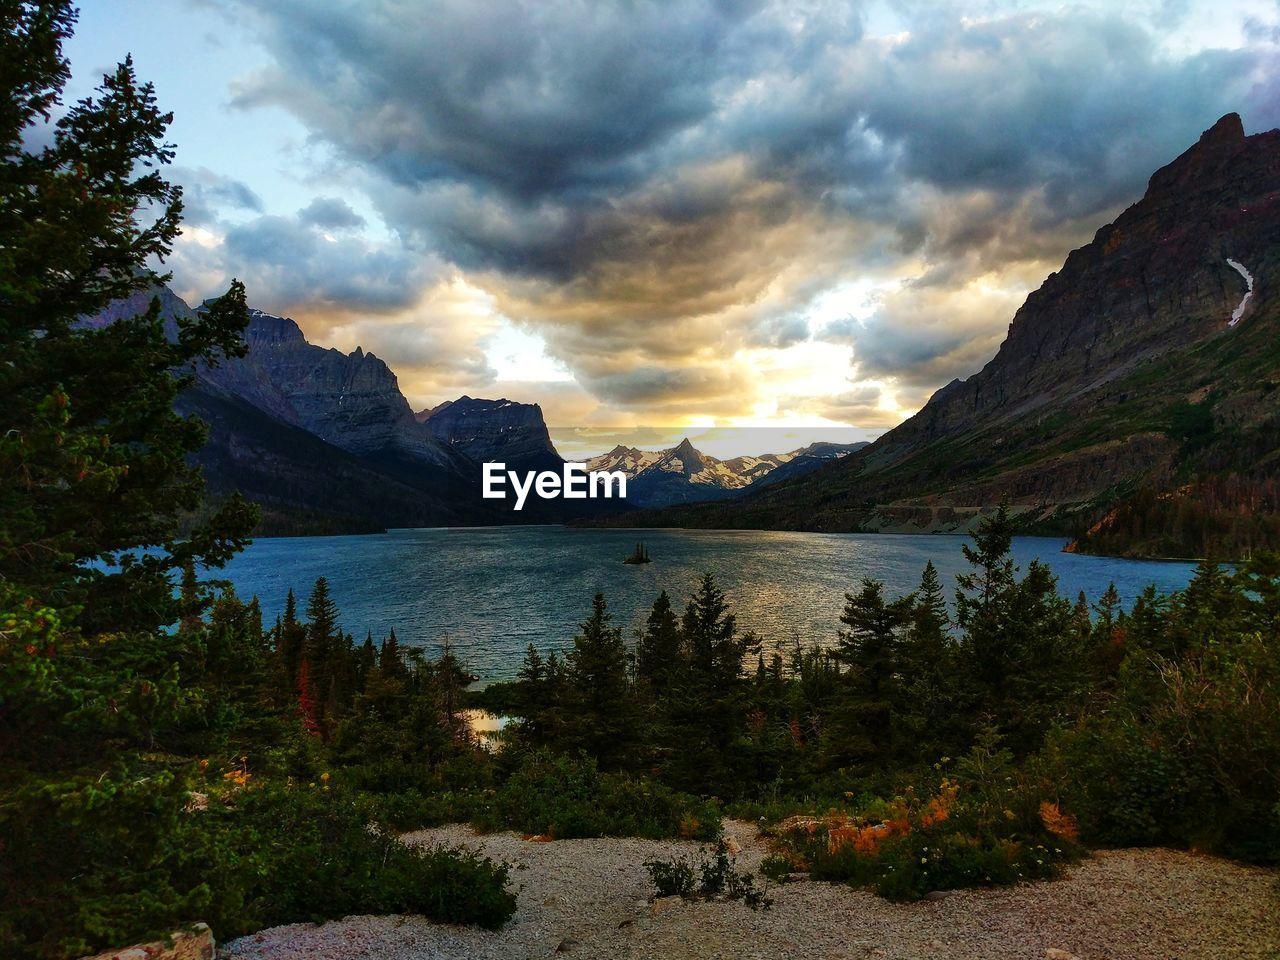 mountain, sky, beauty in nature, cloud - sky, scenics - nature, water, lake, tranquil scene, tranquility, mountain range, tree, nature, plant, non-urban scene, sunset, idyllic, no people, landscape, environment, mountain peak